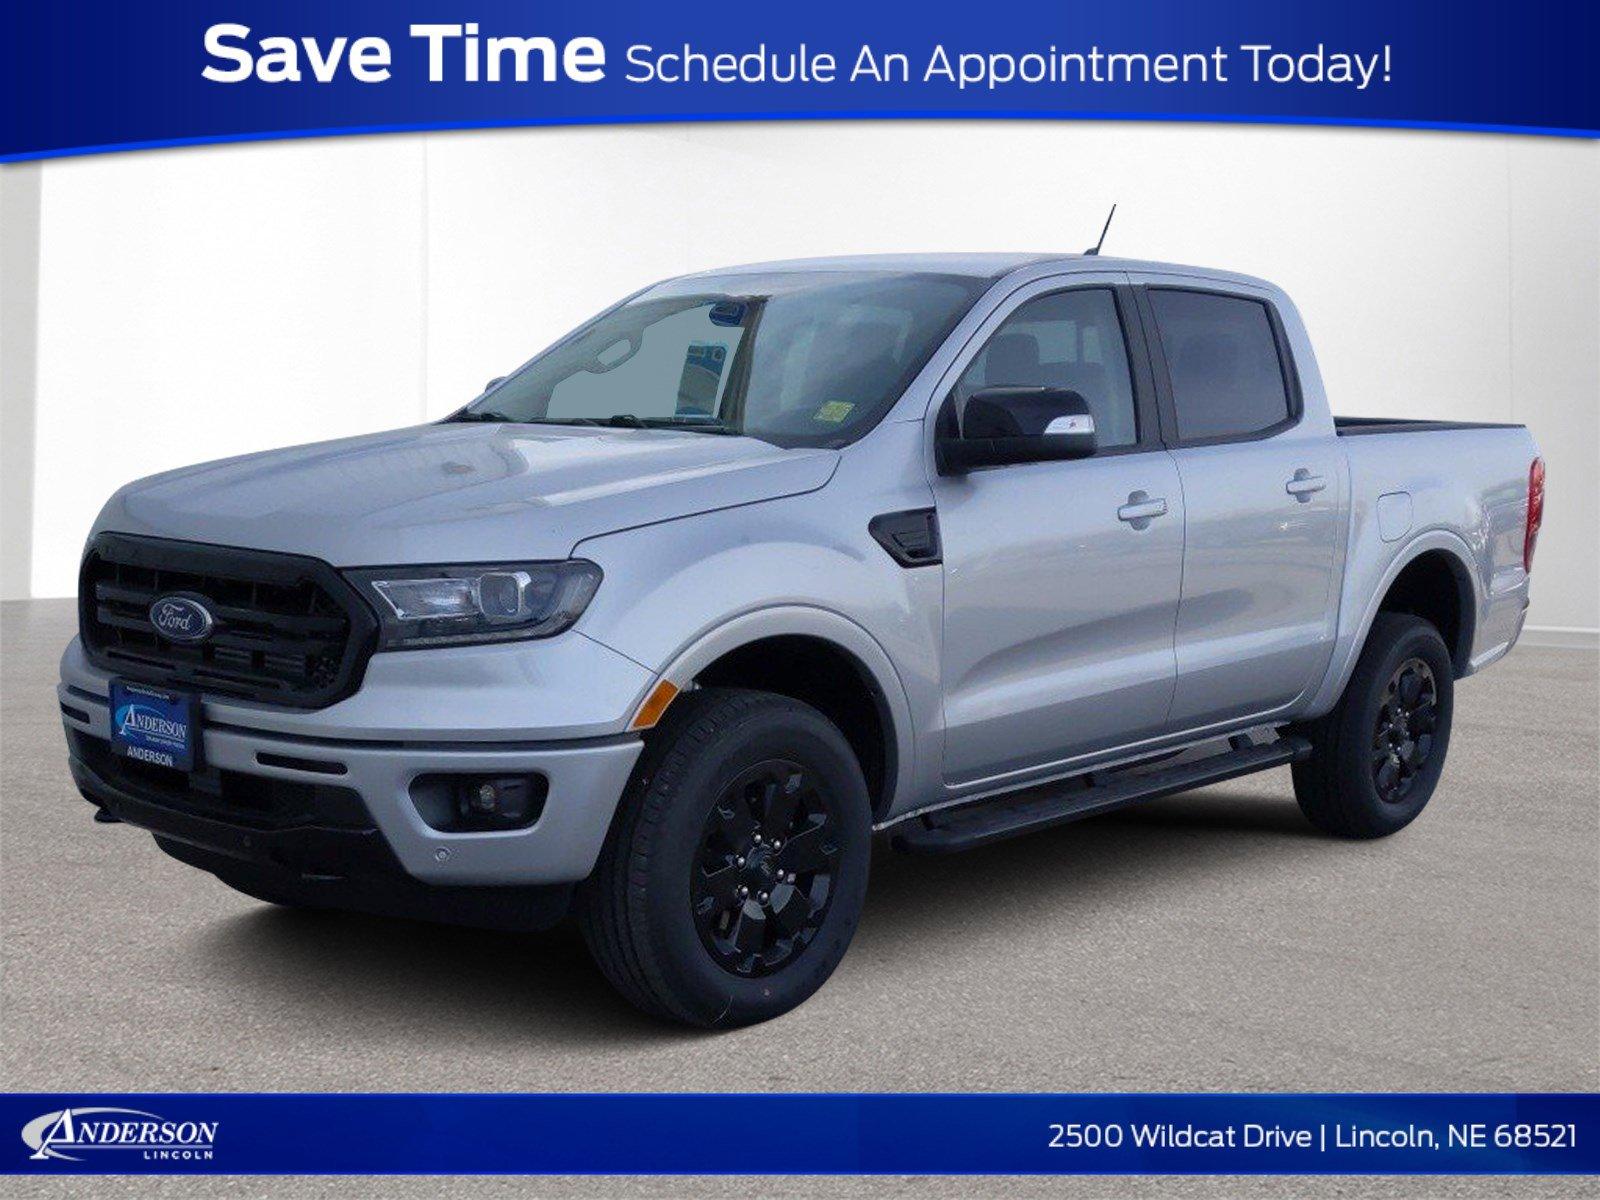 New 2019 Ford Ranger Lariat Crew Cab Pickup for sale in Lincoln NE